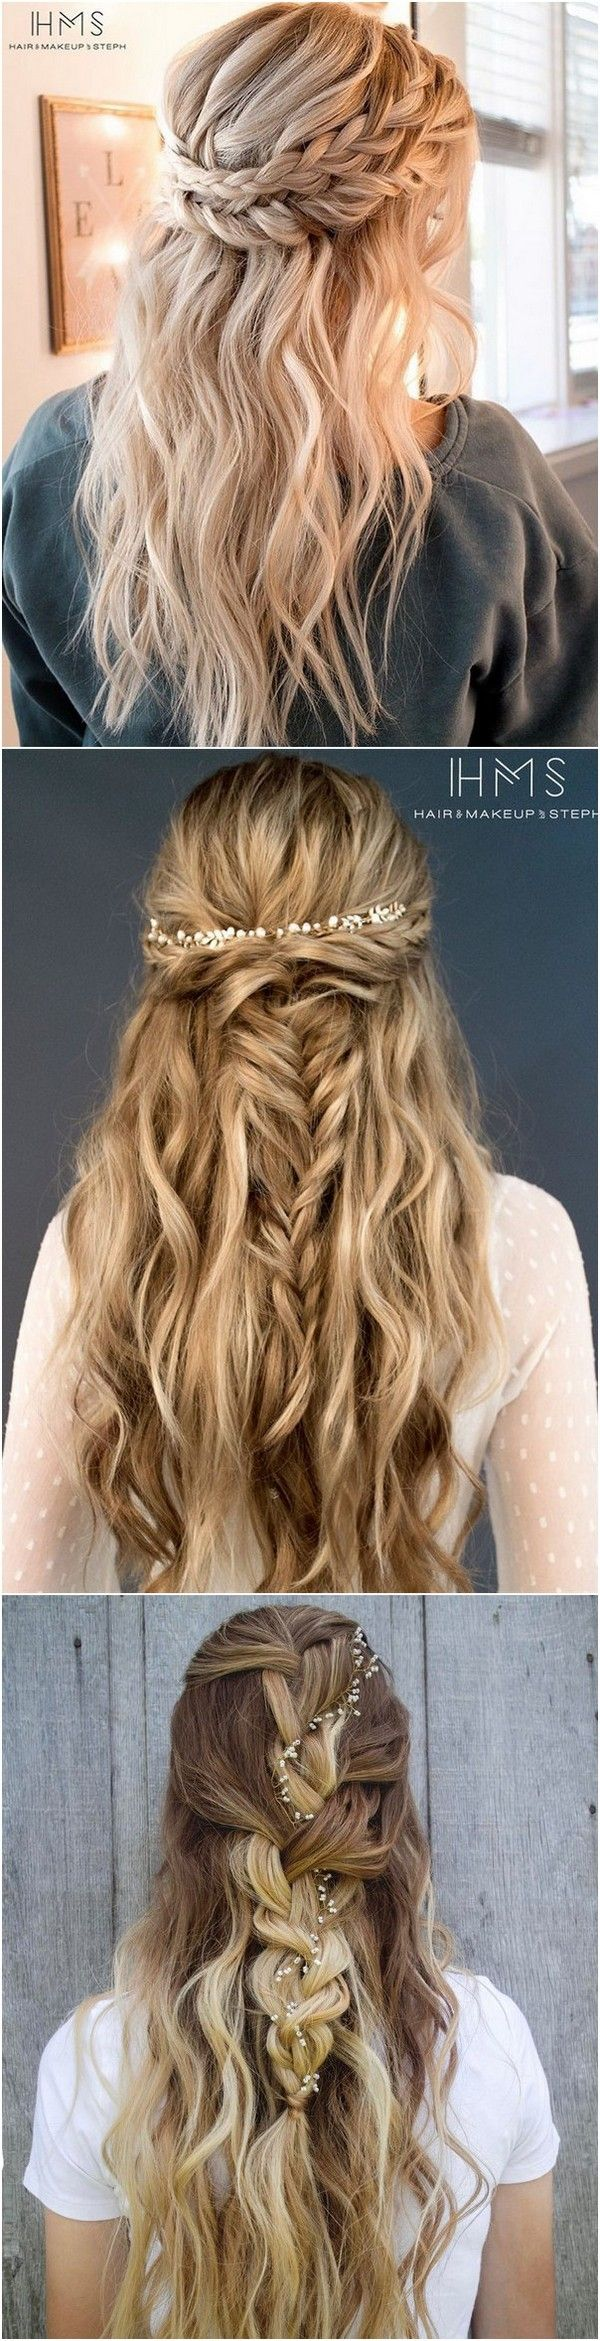 Inspiring Wedding Hairstyles from Steph on Instagram Emilyus